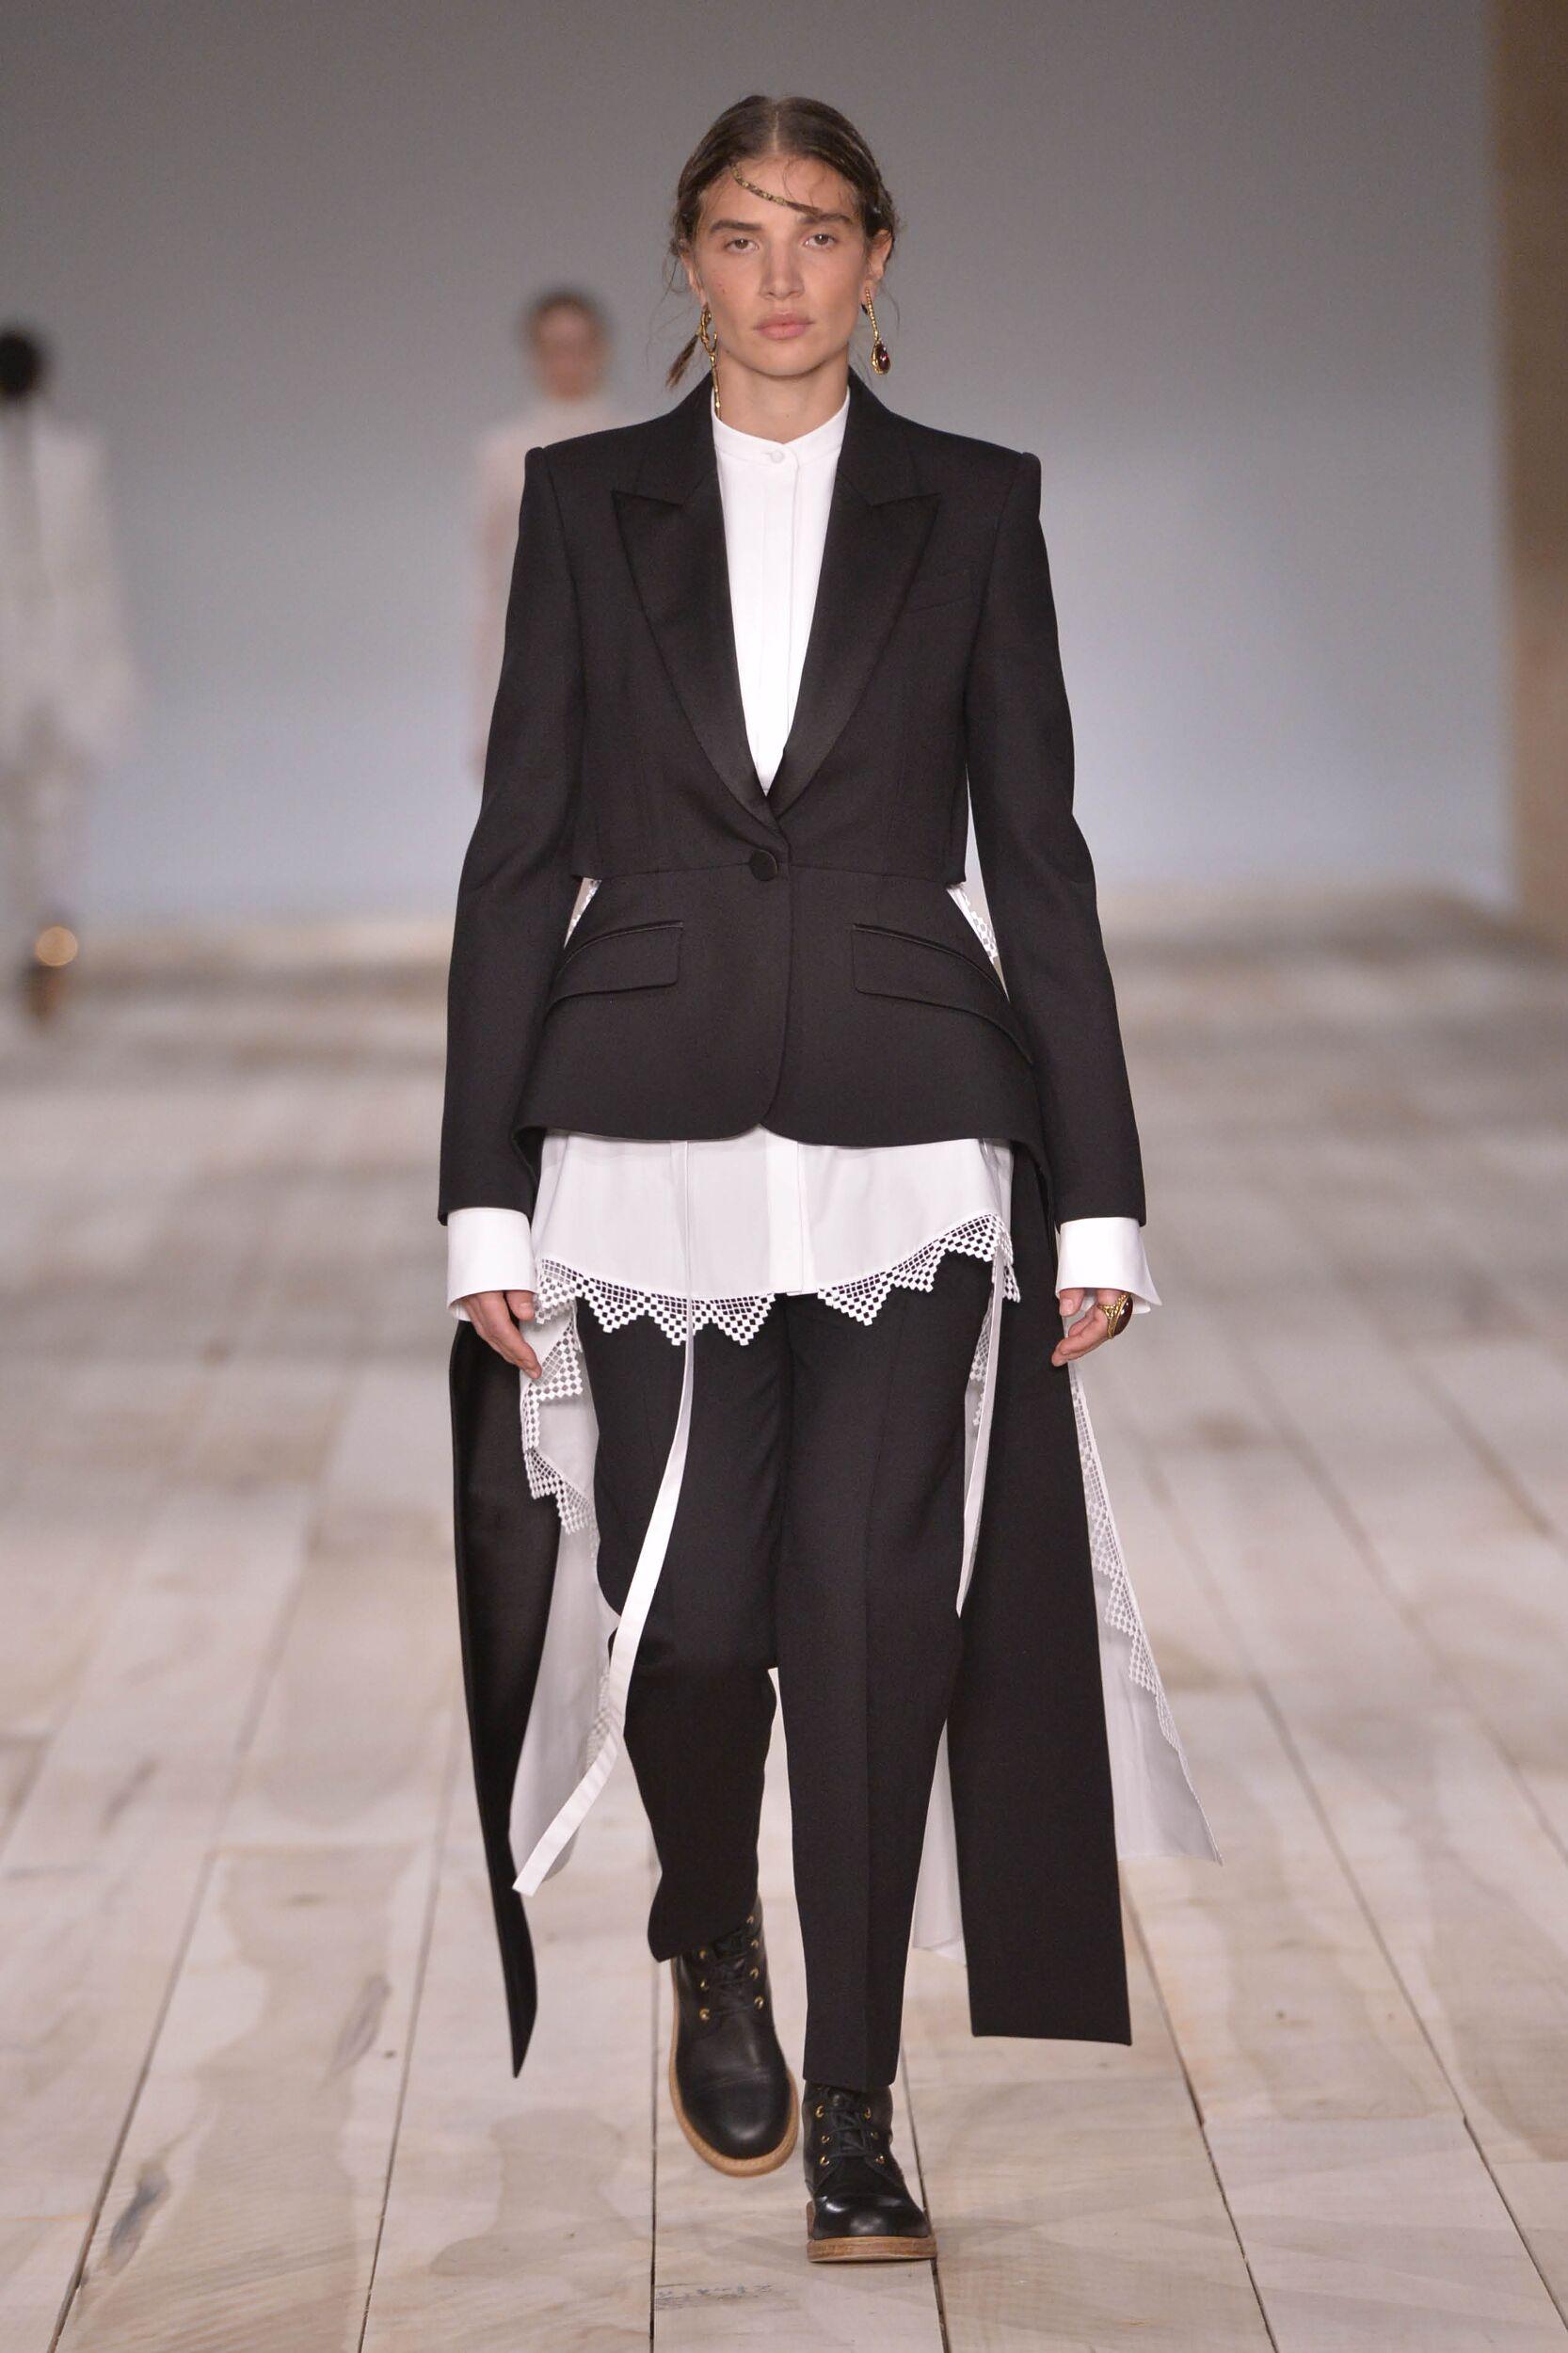 Fashion Model Woman Alexander McQueen Catwalk